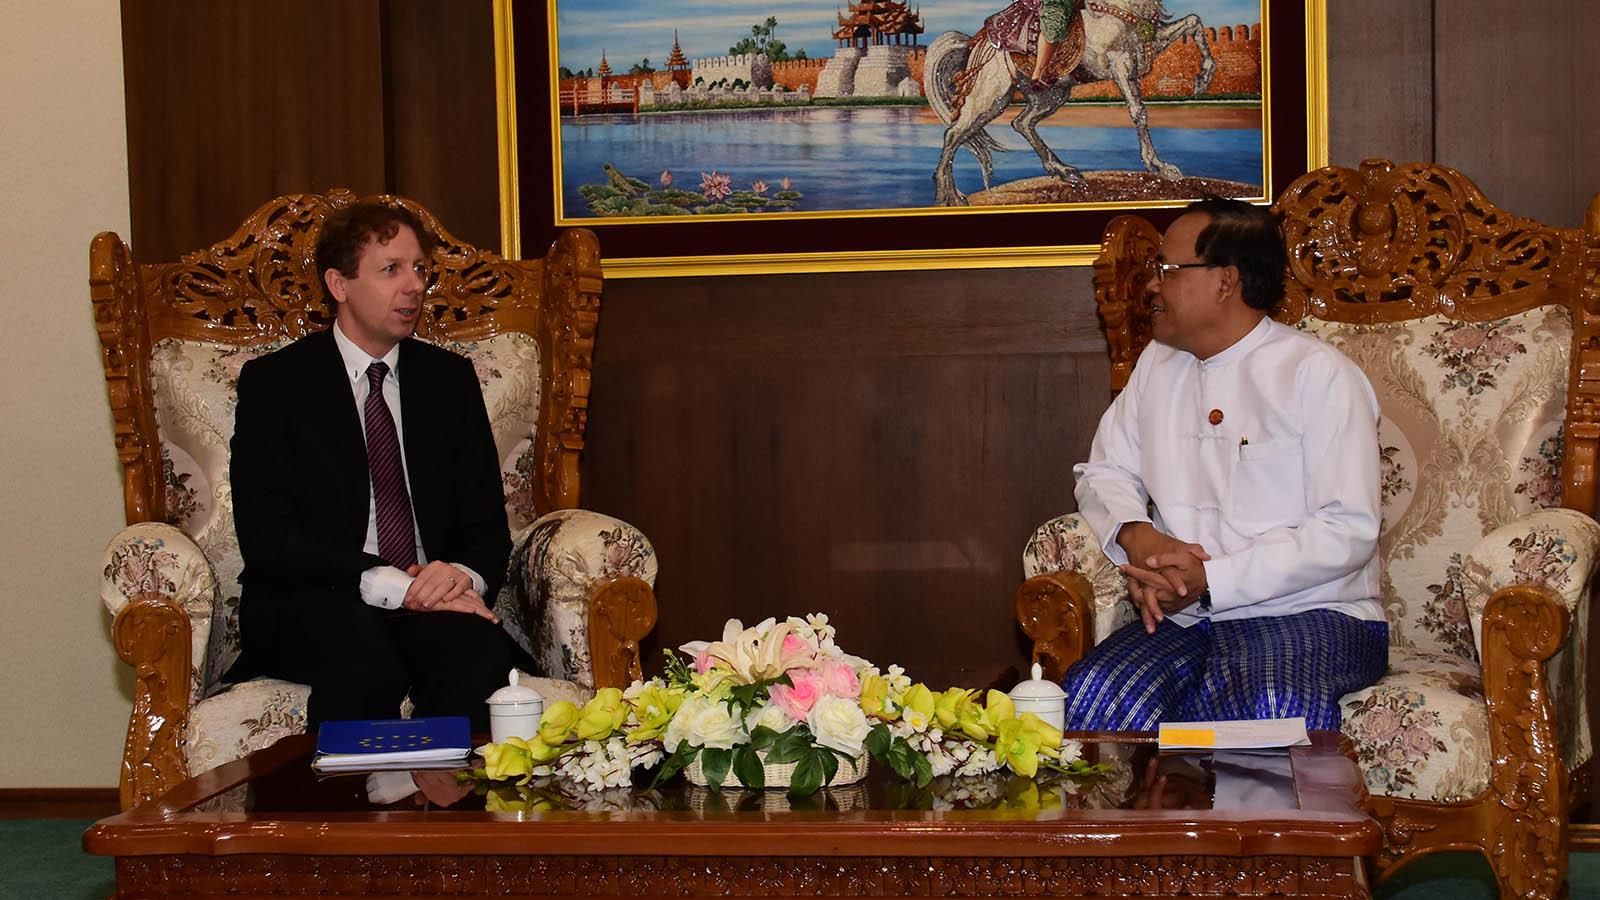 Union Minister U Kyaw Tin holds talk with Ambassador of the European Union to ASEAN in Jarkarta, Mr Igor Driesmans in Nay Pyi Taw yesterday.Photo: MNA